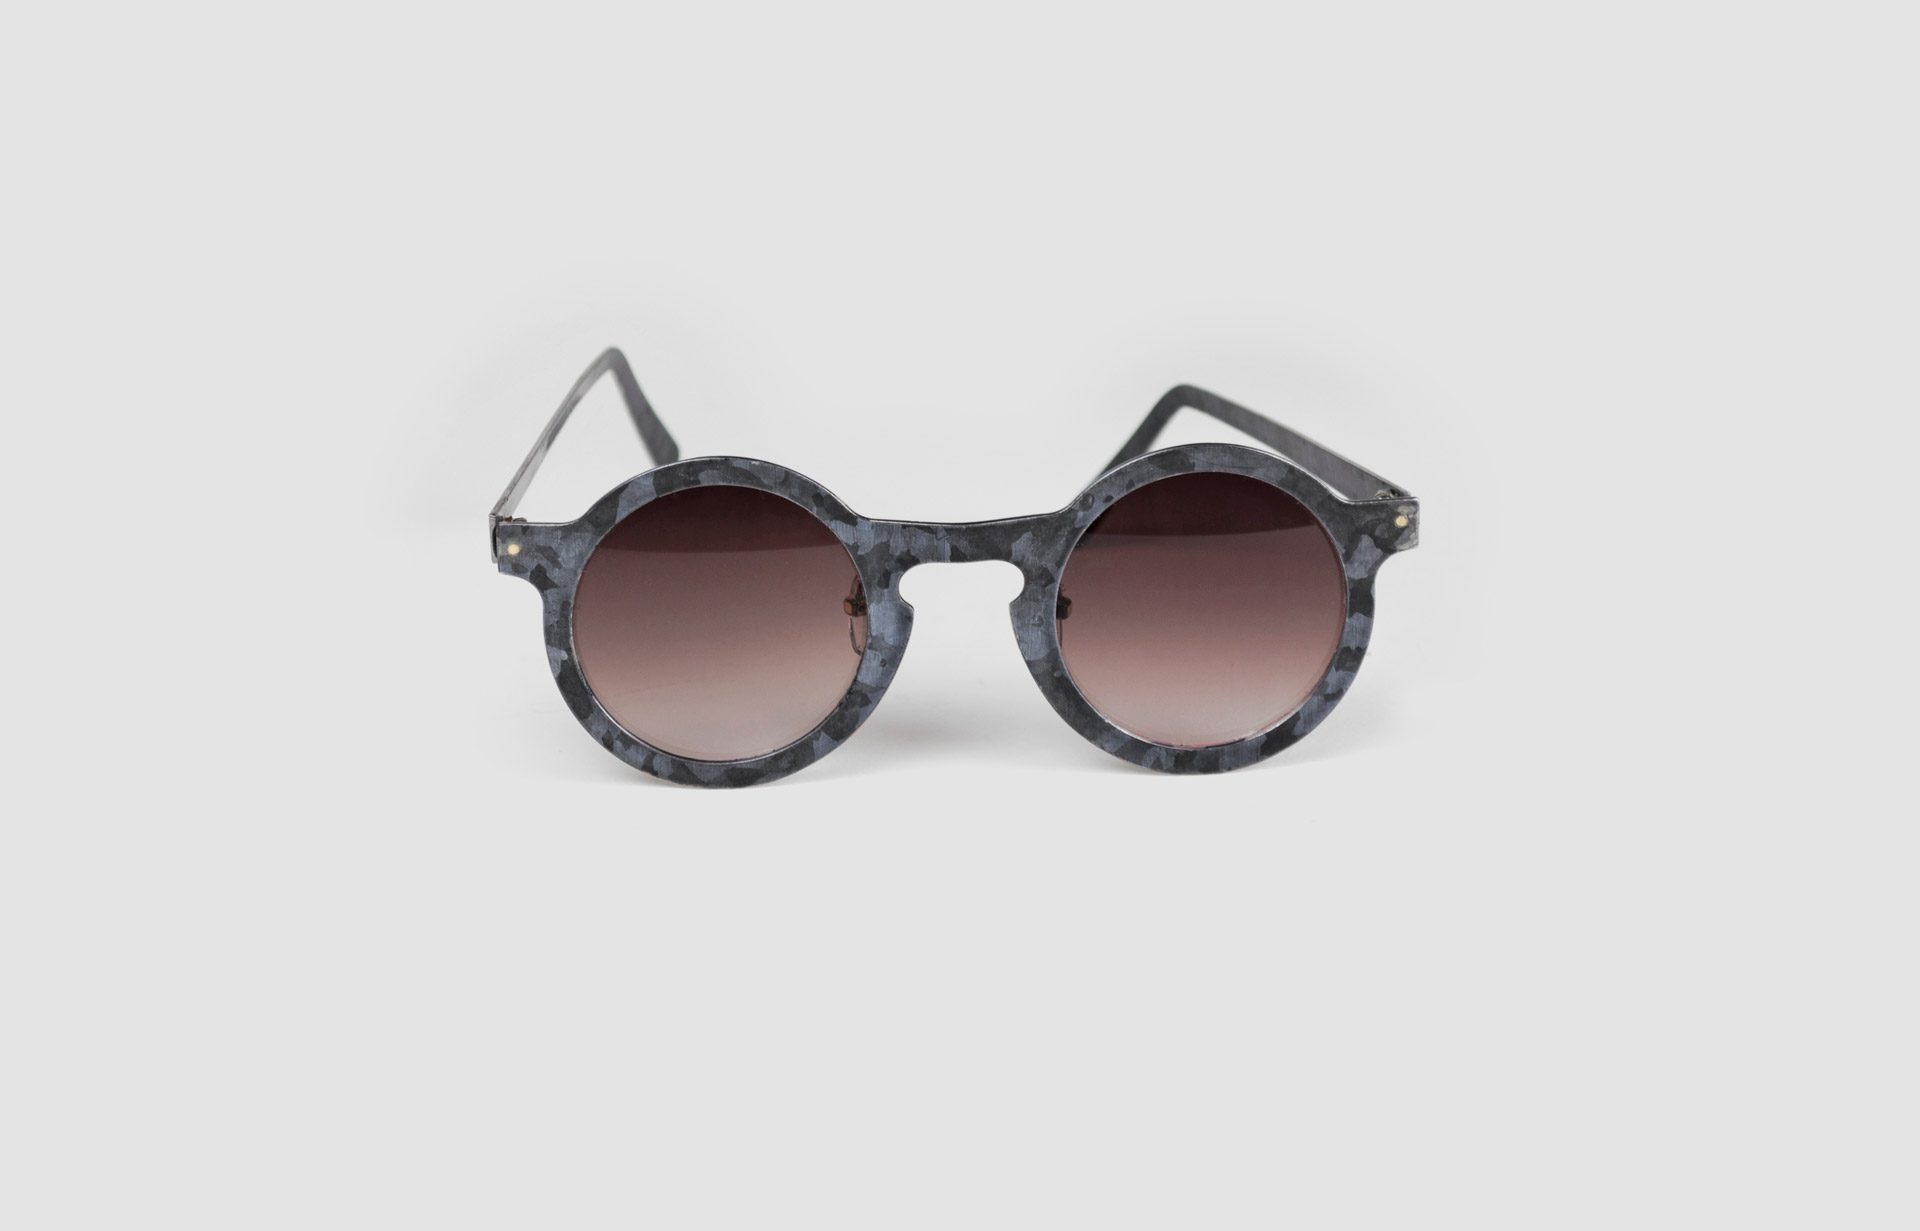 Tino Seubert - Regalvanize - Glasses